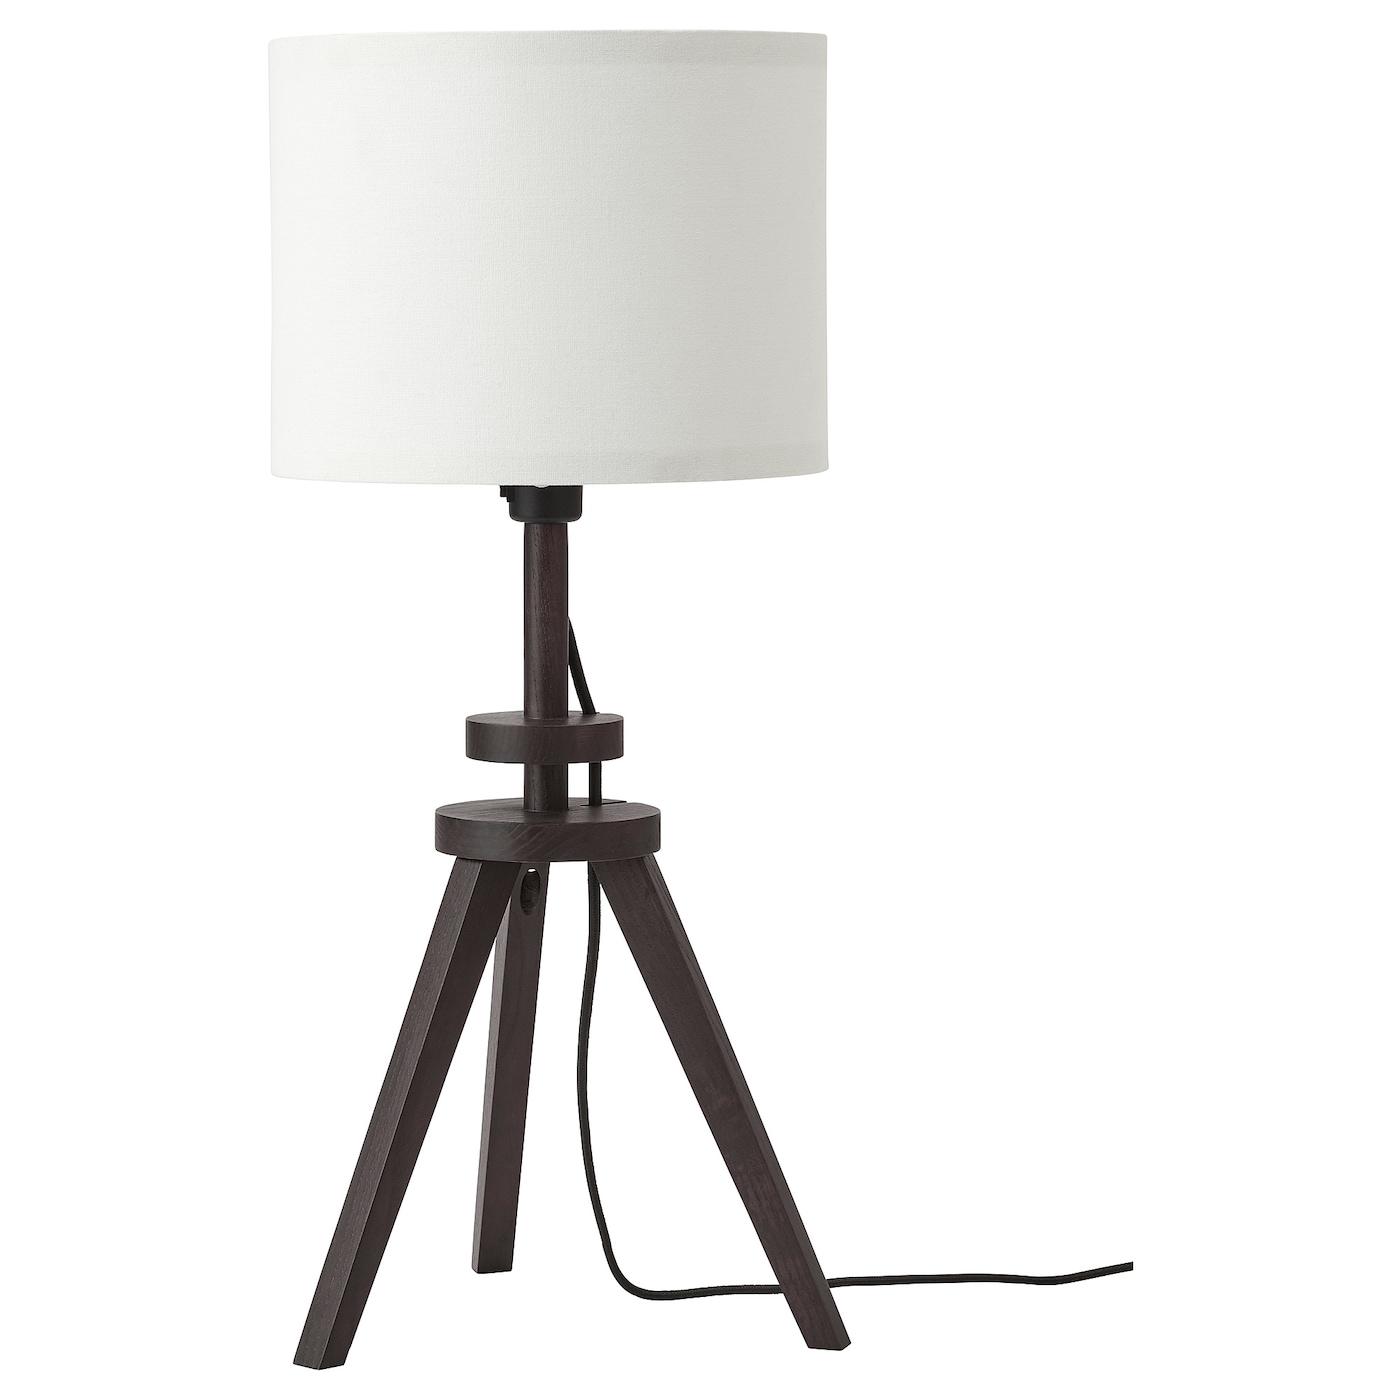 LAUTERS Table lamp brown ashwhite